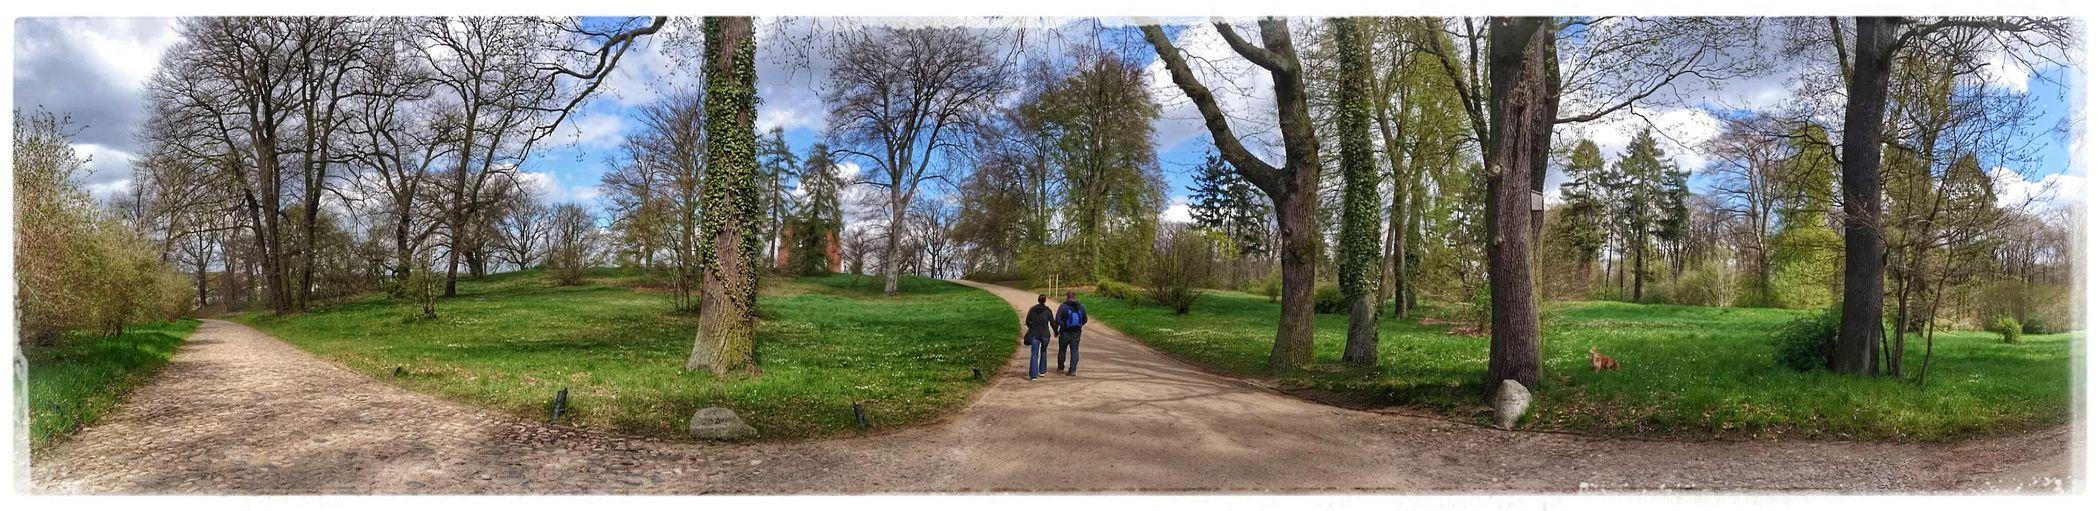 Panoramicview Babelsberg Parklife Spaziergang Inthepark